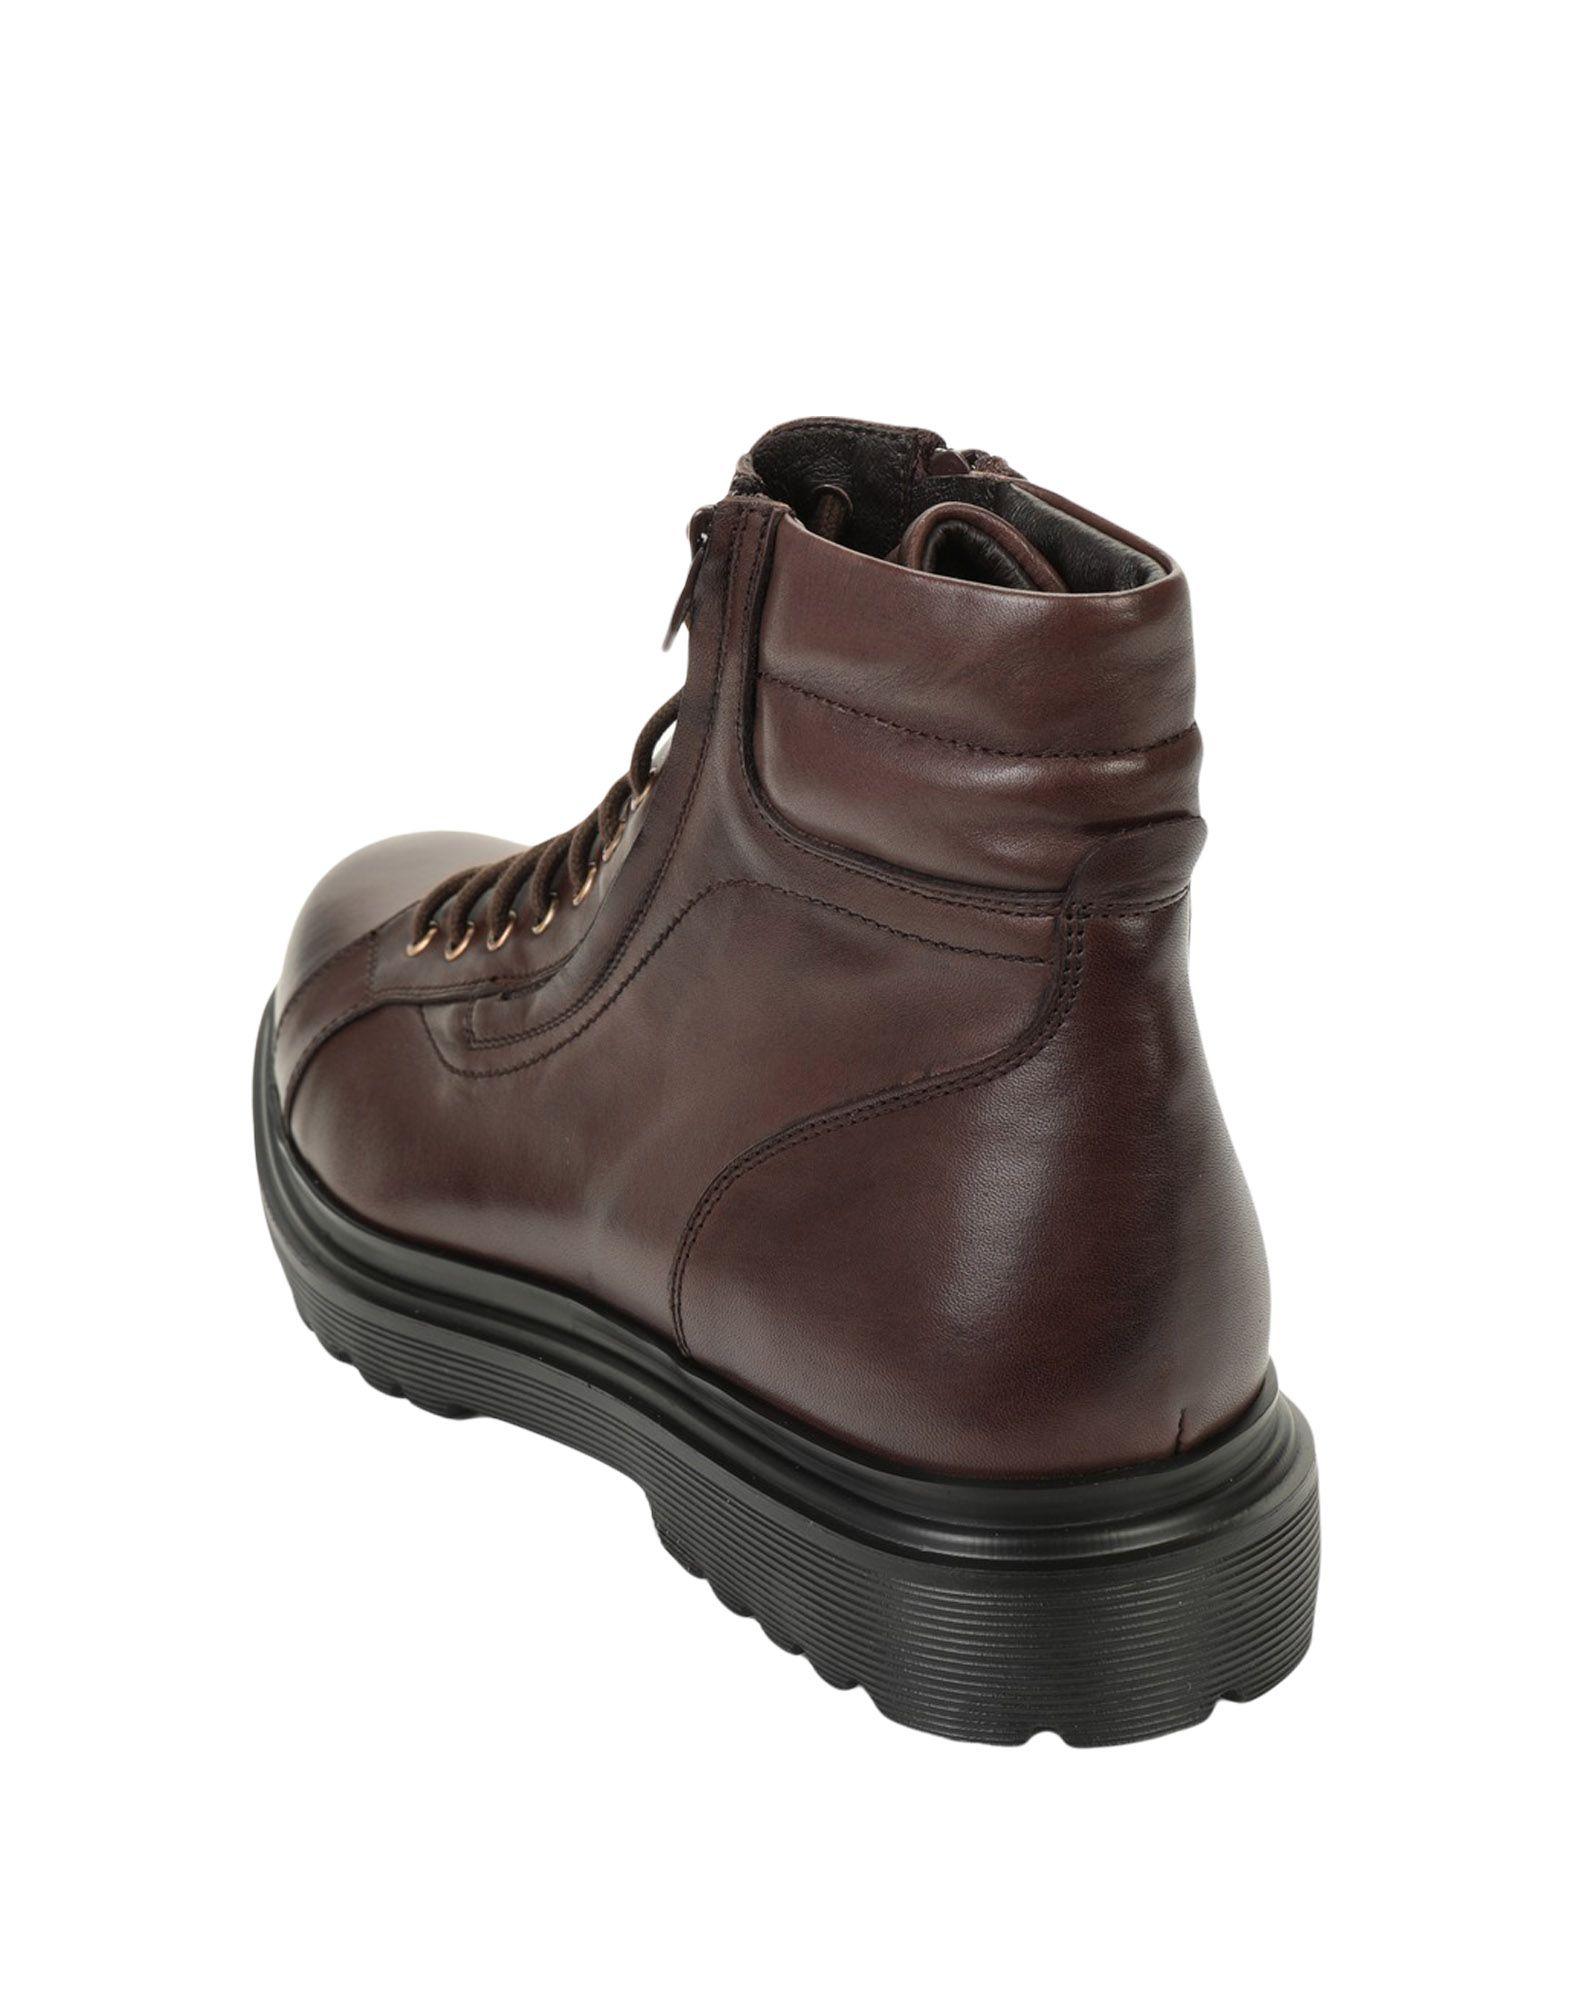 Maldini Stiefelette Herren Heiße  11538156KK Heiße Herren Schuhe 7f829d